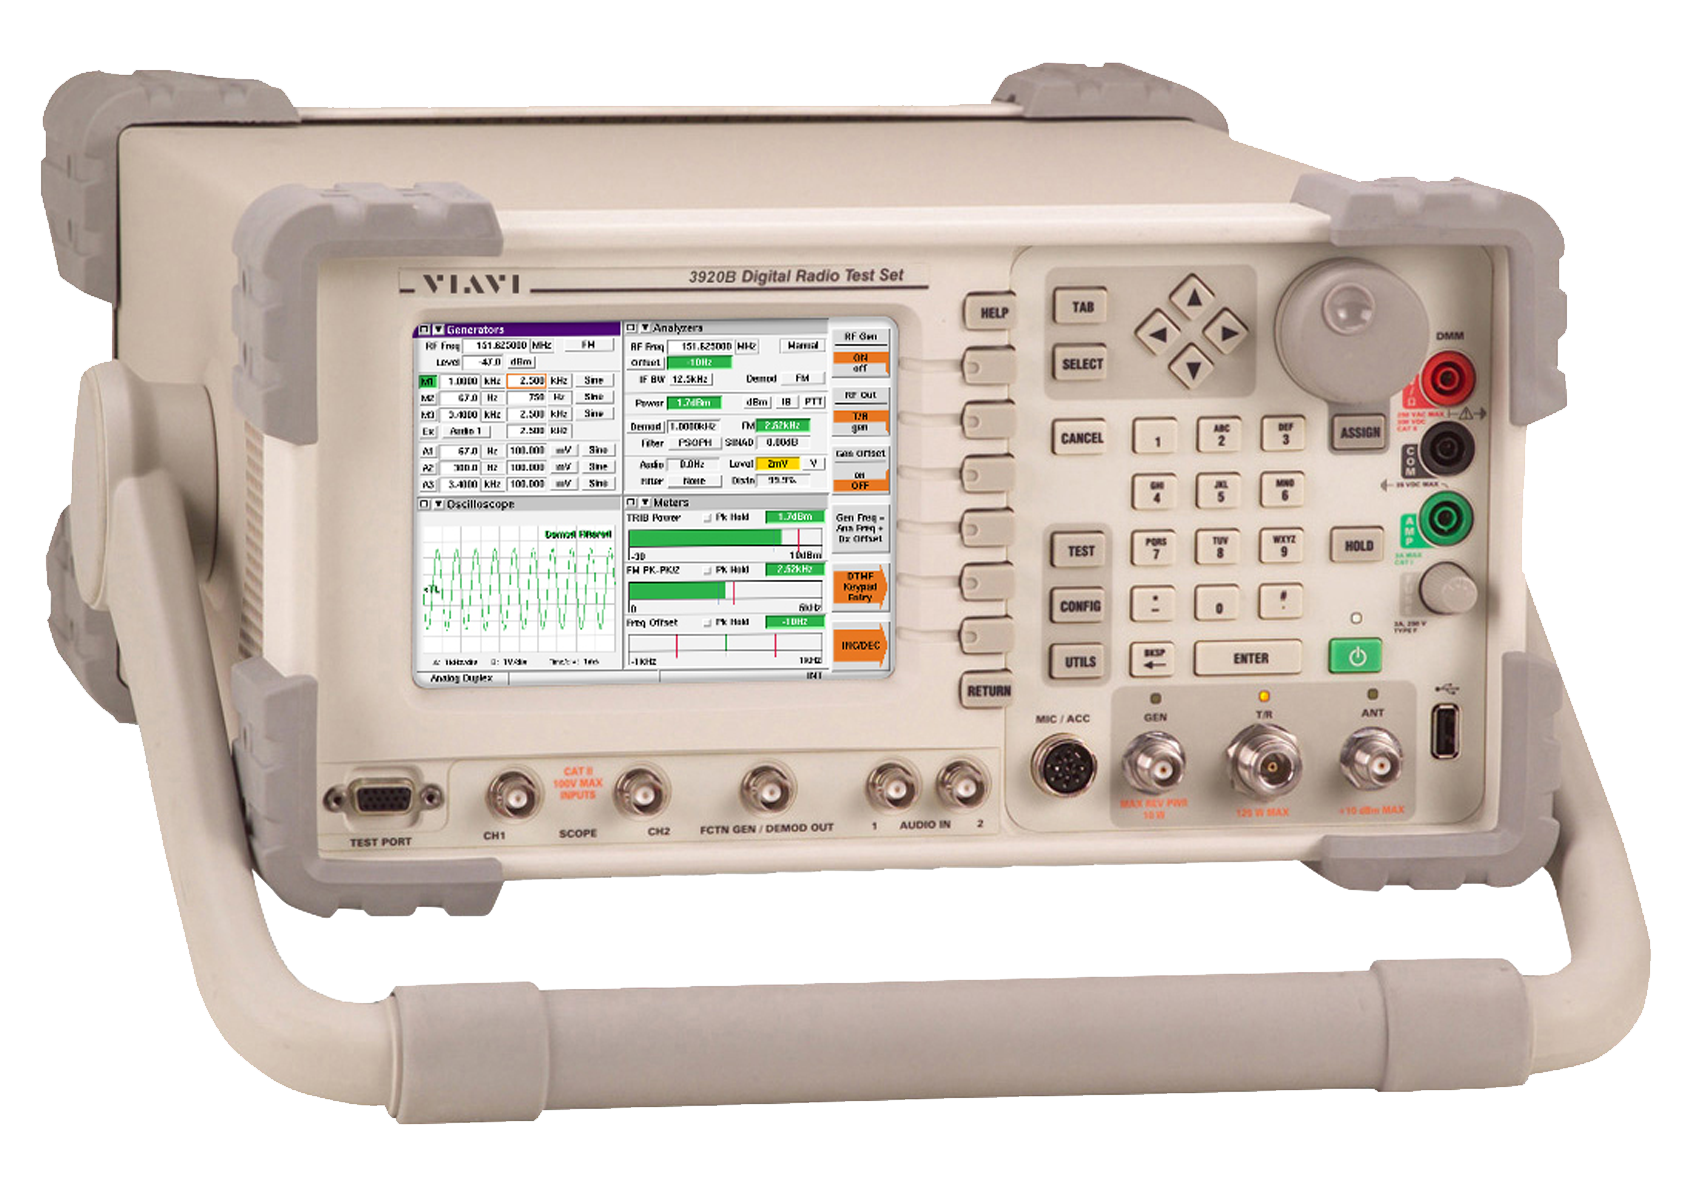 VIAVI 3920B Radio Test Set front qtr